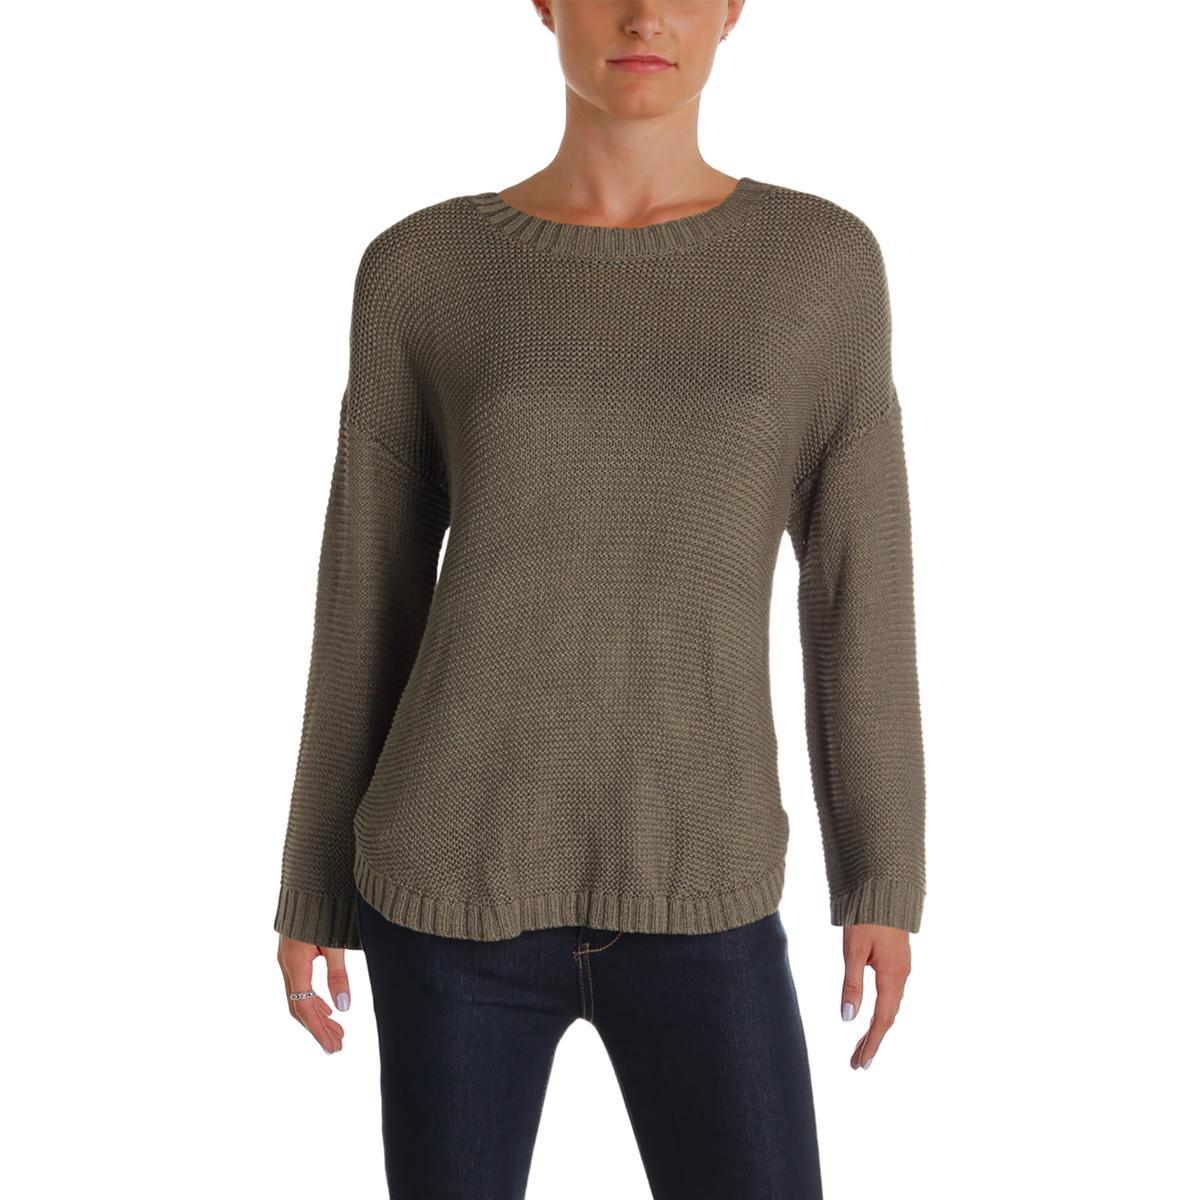 df06f11f6 Details about Lauren Ralph Lauren Womens Vandrella Three-Quarter Sleeve  Sweater Top BHFO 6513